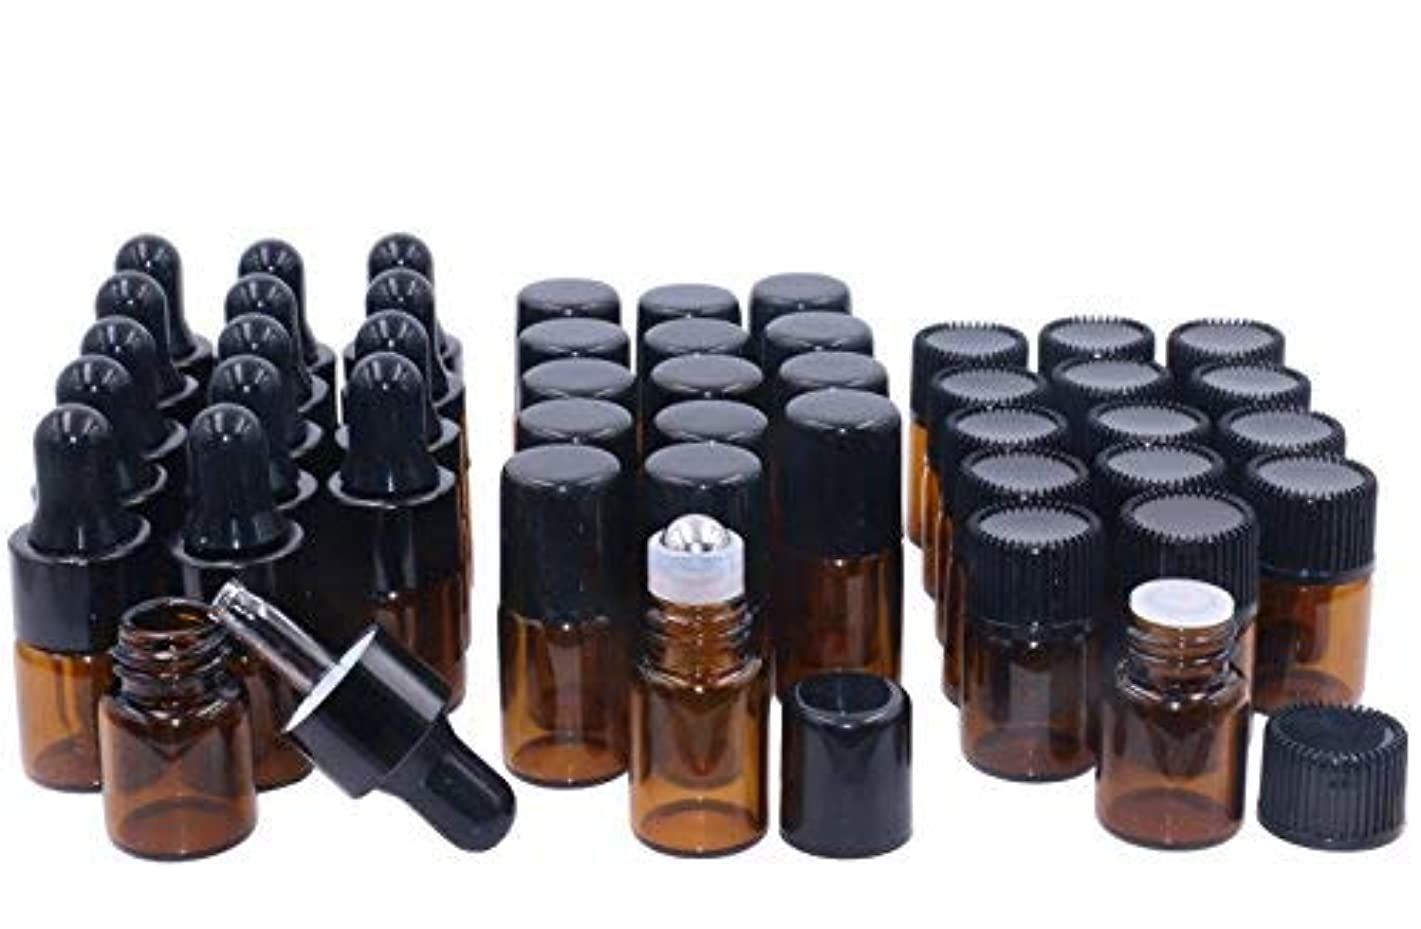 Wresty Essential Oil Bottles,2ml 45 Pack Glass Roller Bottles and Amber Dropper Bottles Essential Oil Sample Vails...